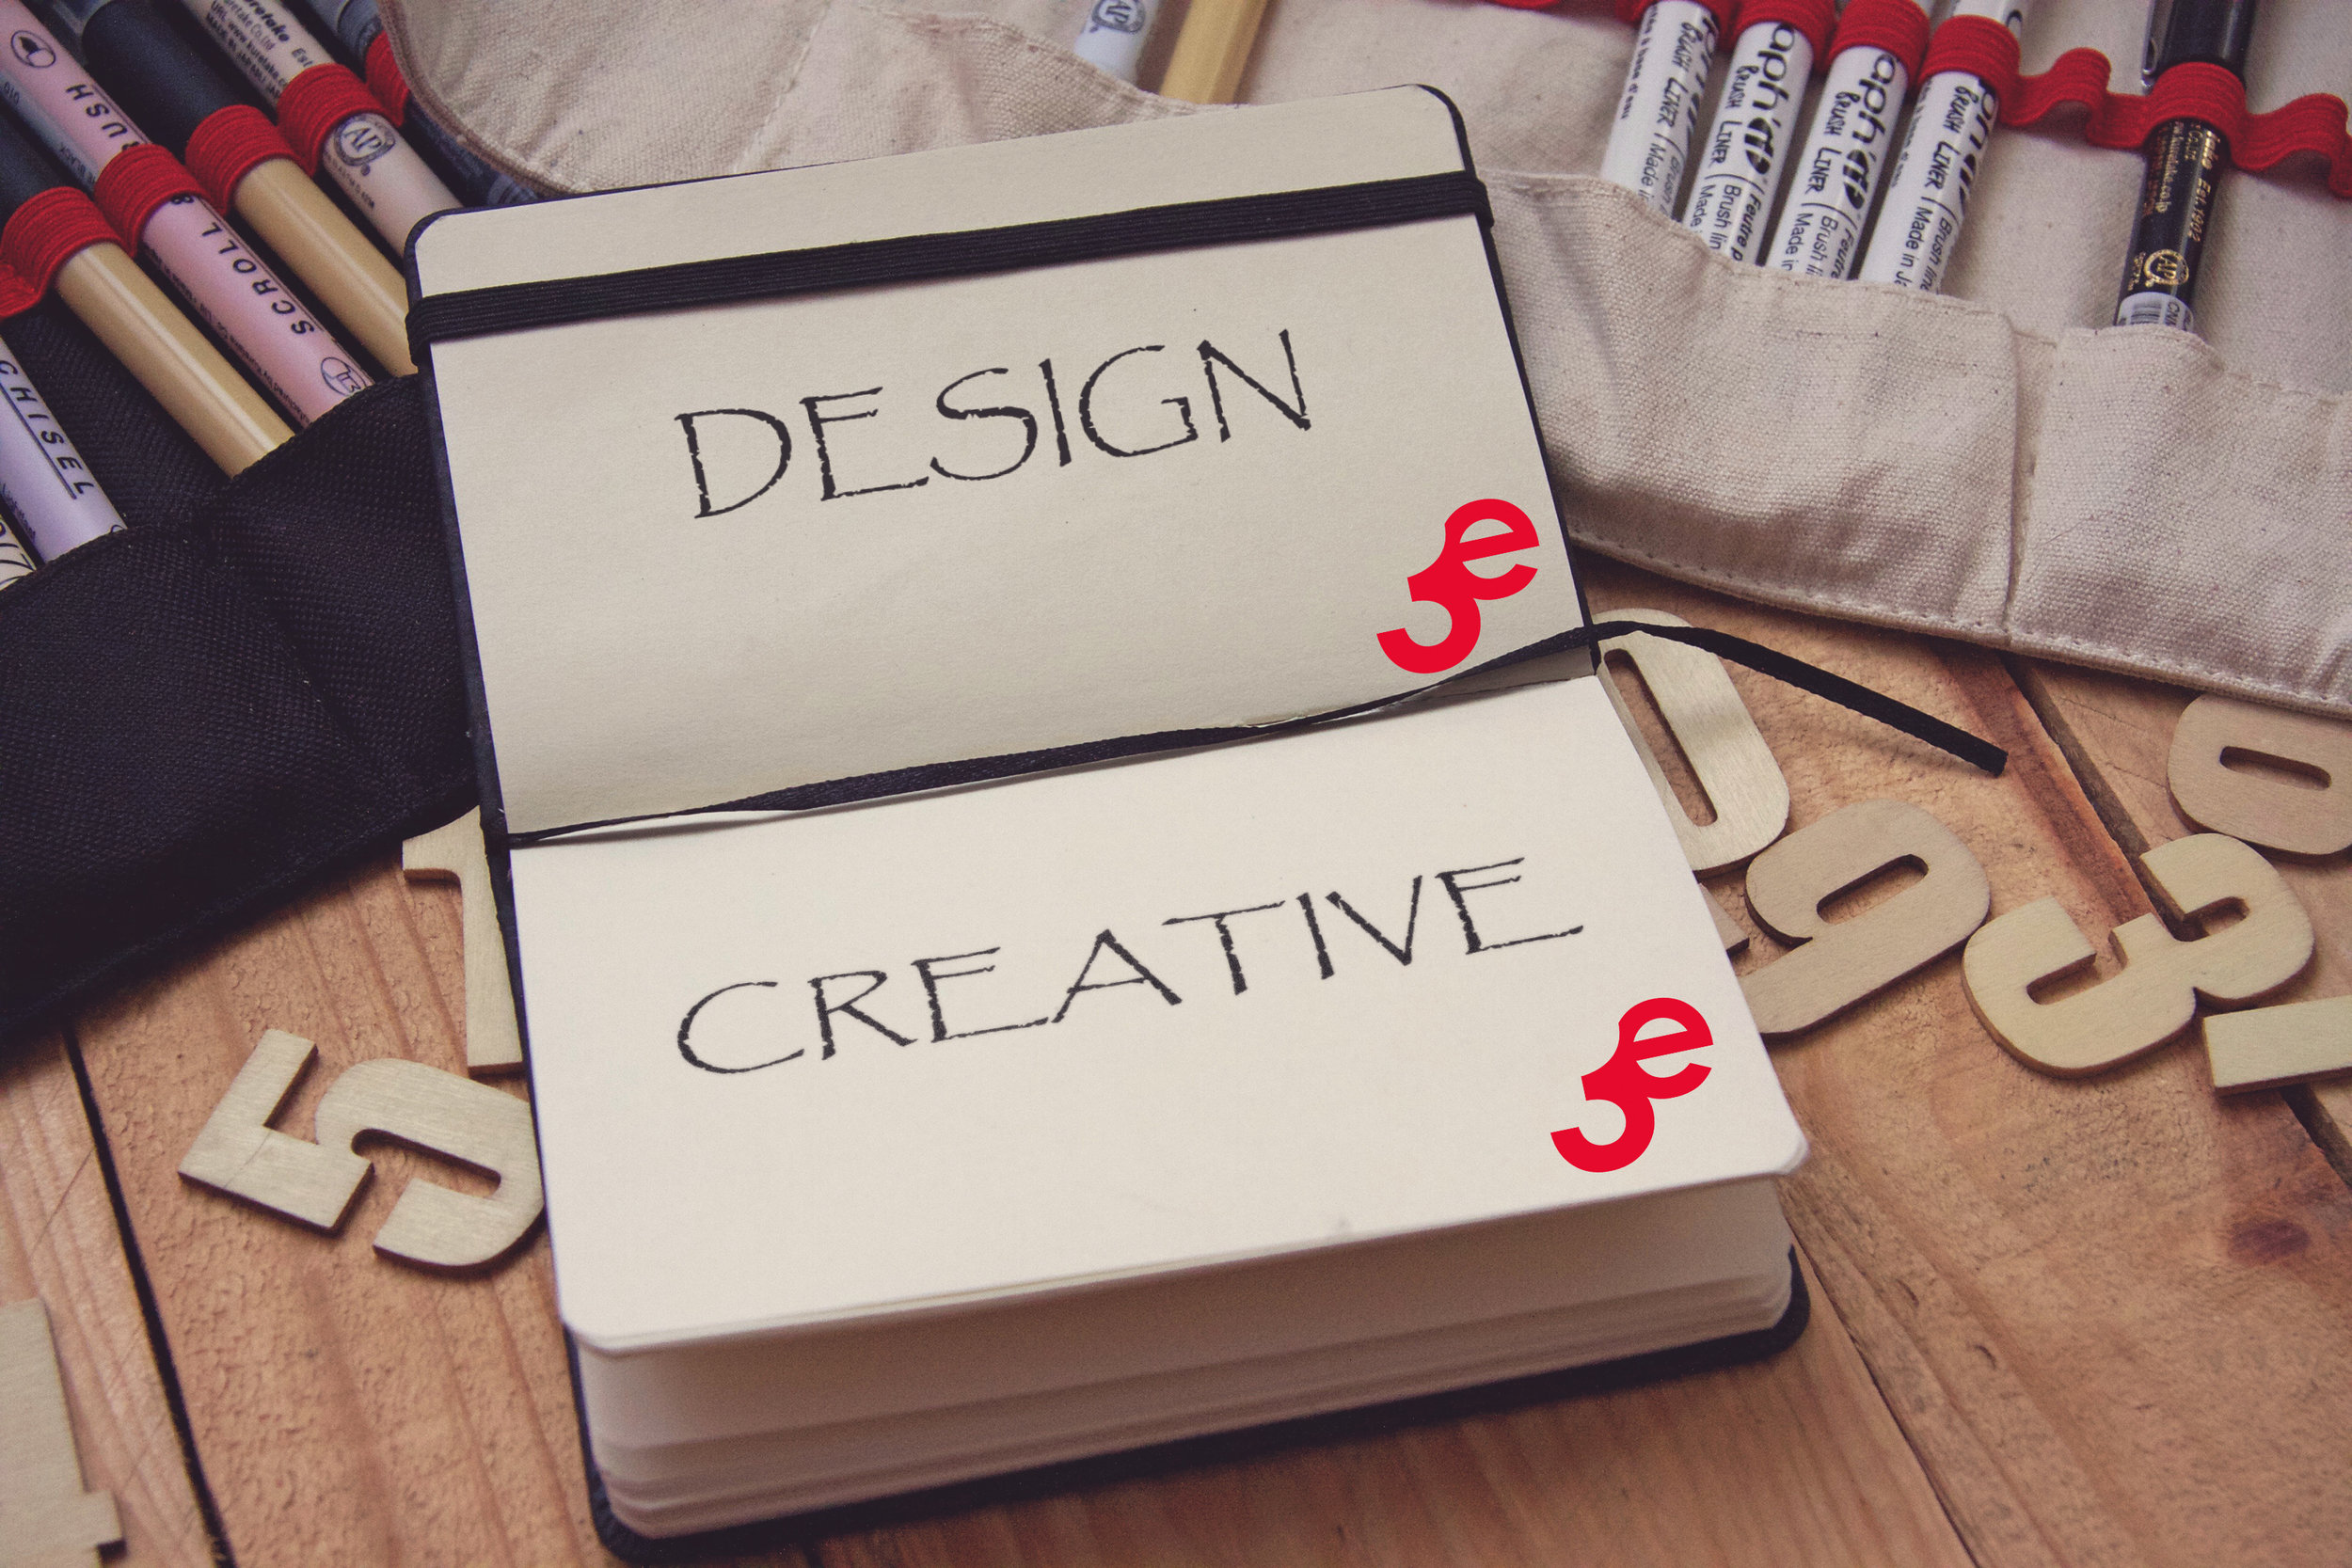 DESIGN CREATIVE.jpg